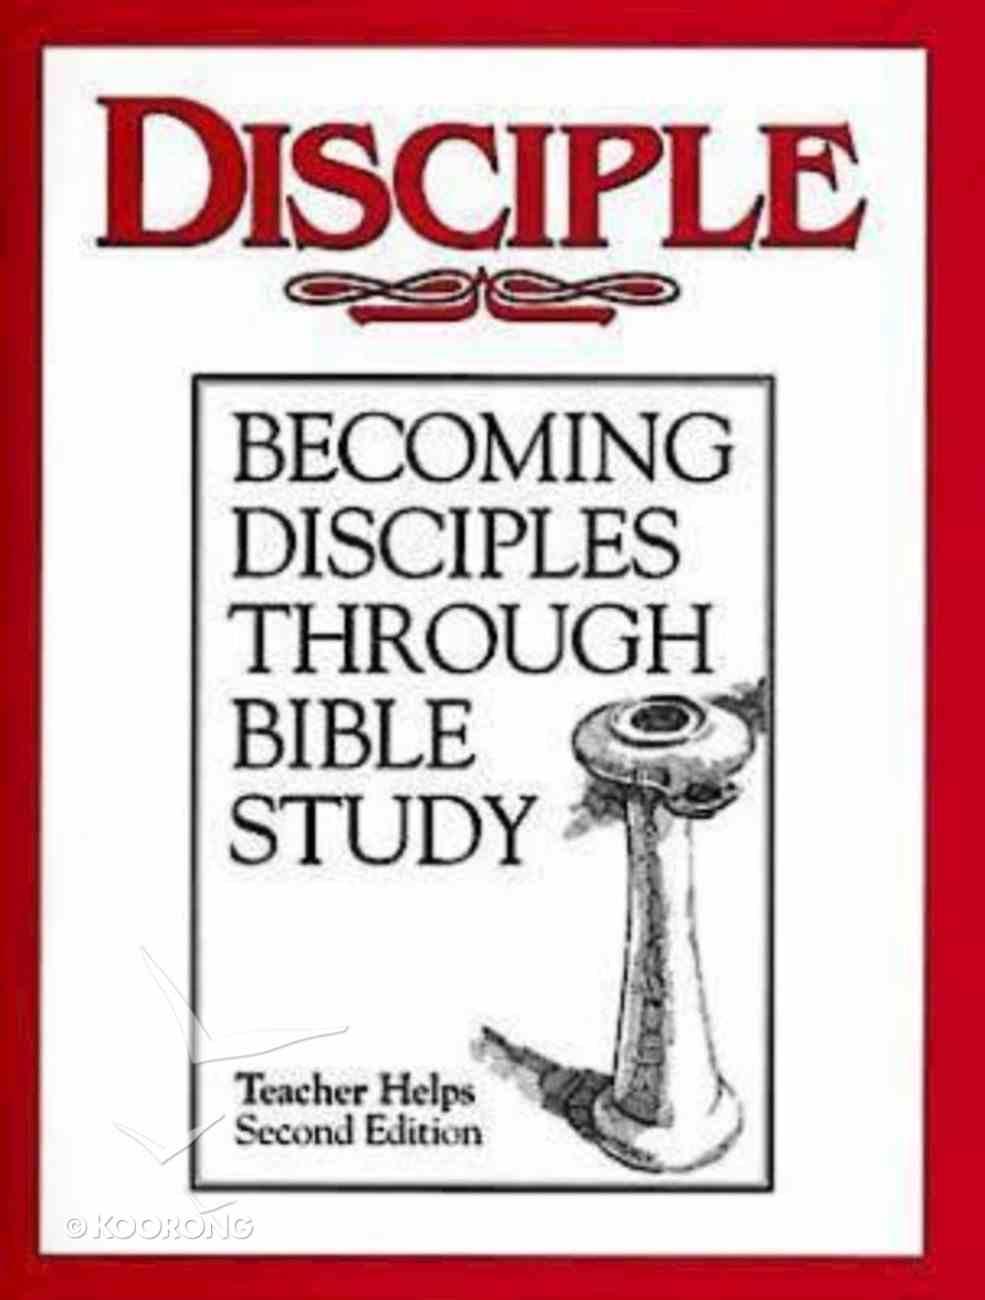 Disciple I Becoming Disciples Through Bible Study (Teacher Helps) eBook